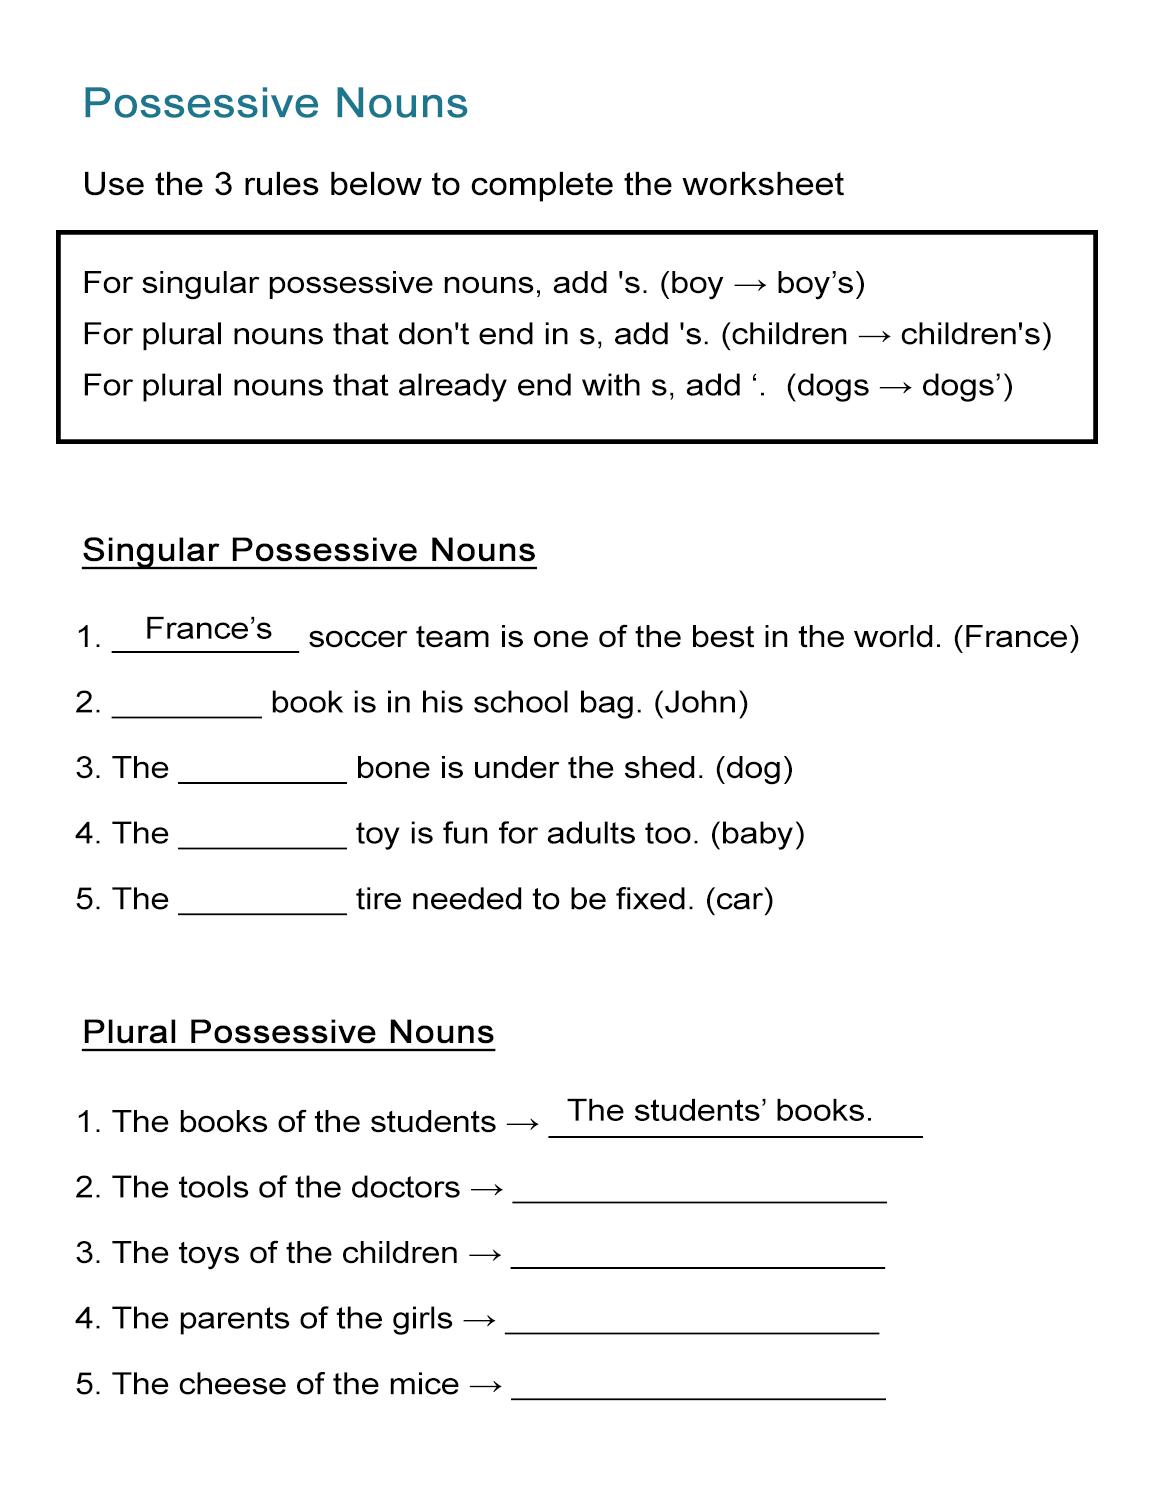 Possessive Nouns Worksheet: Singular And Plural Nouns - All Esl - Free Printable Possessive Nouns Worksheets